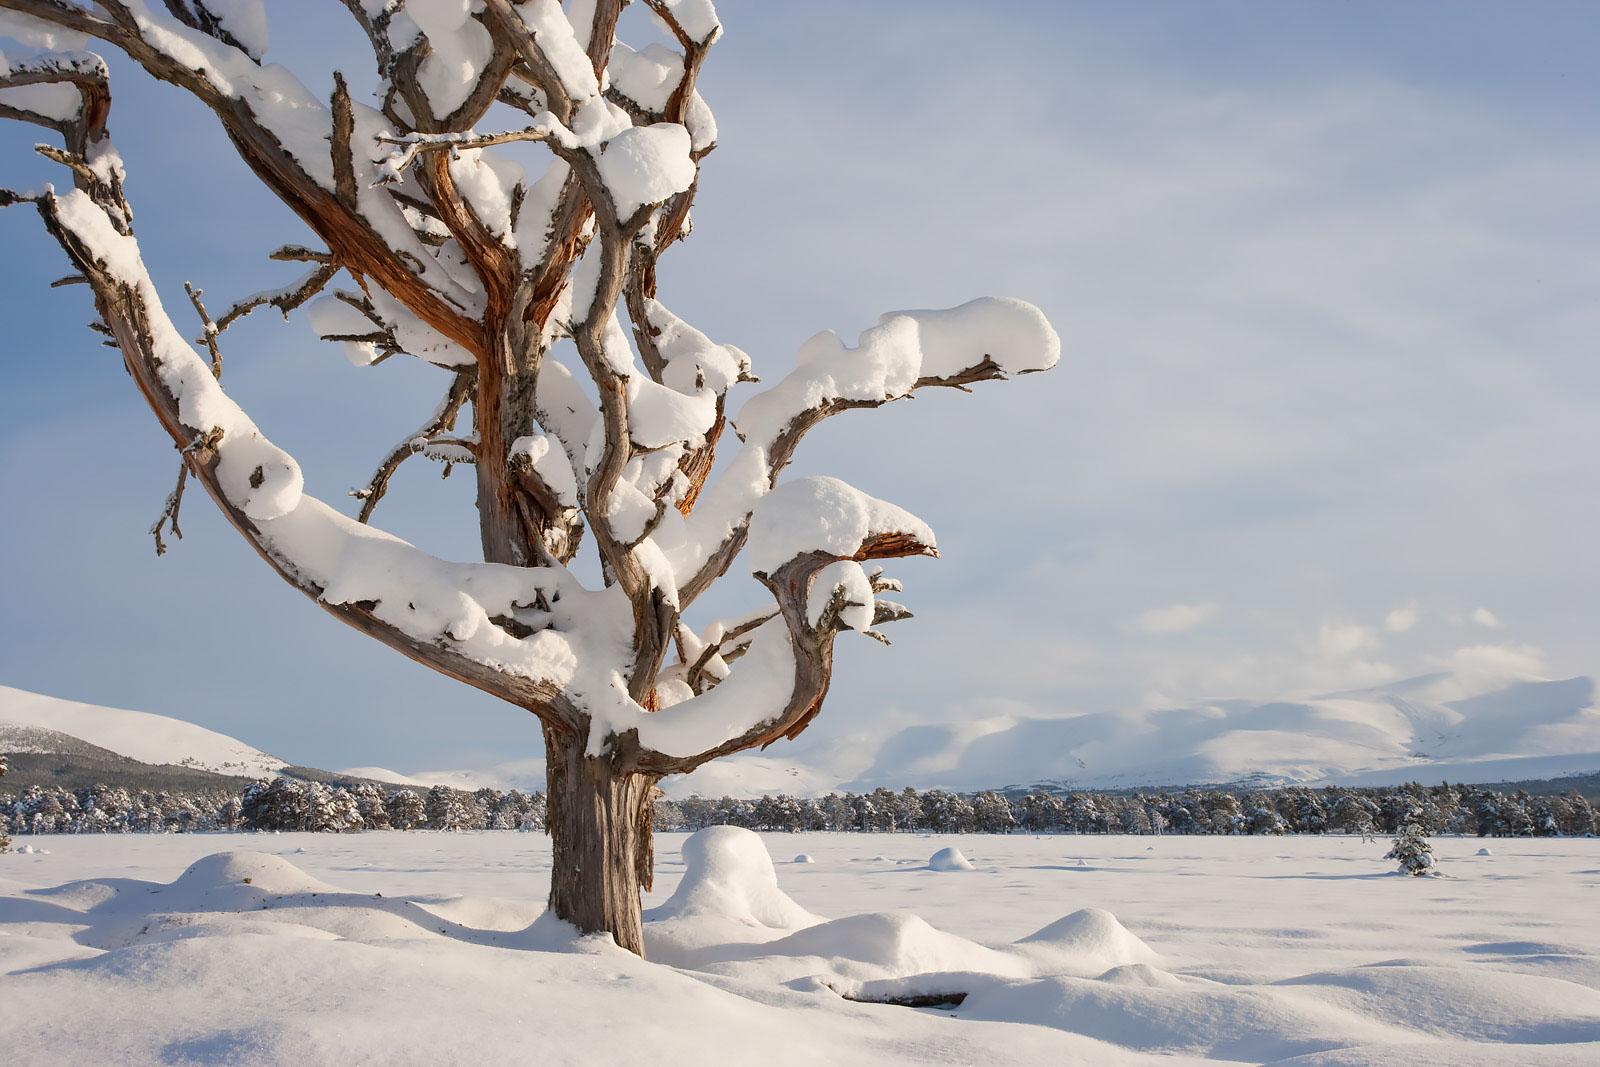 Dead Scot's pine (Pinus sylvestris) in winter, Cairngorms National Park, Scotland, January 2010